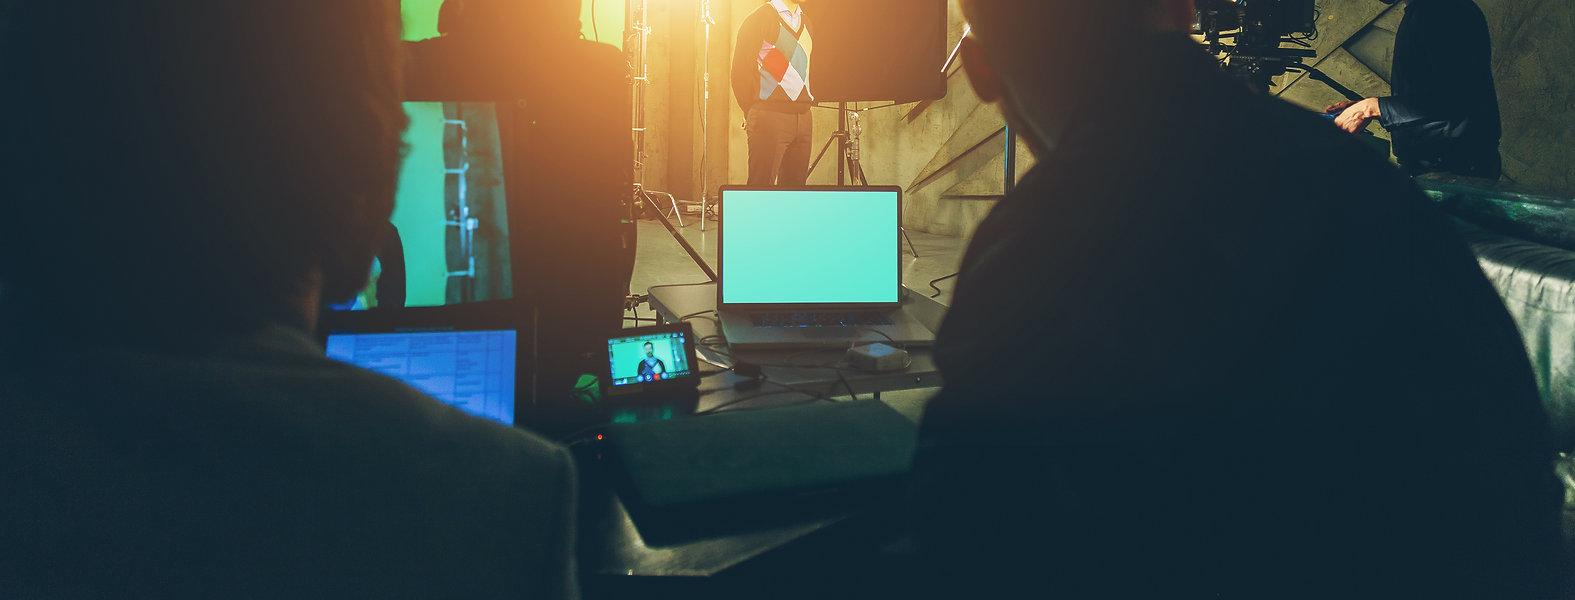 actor in studio posing on green screen.j